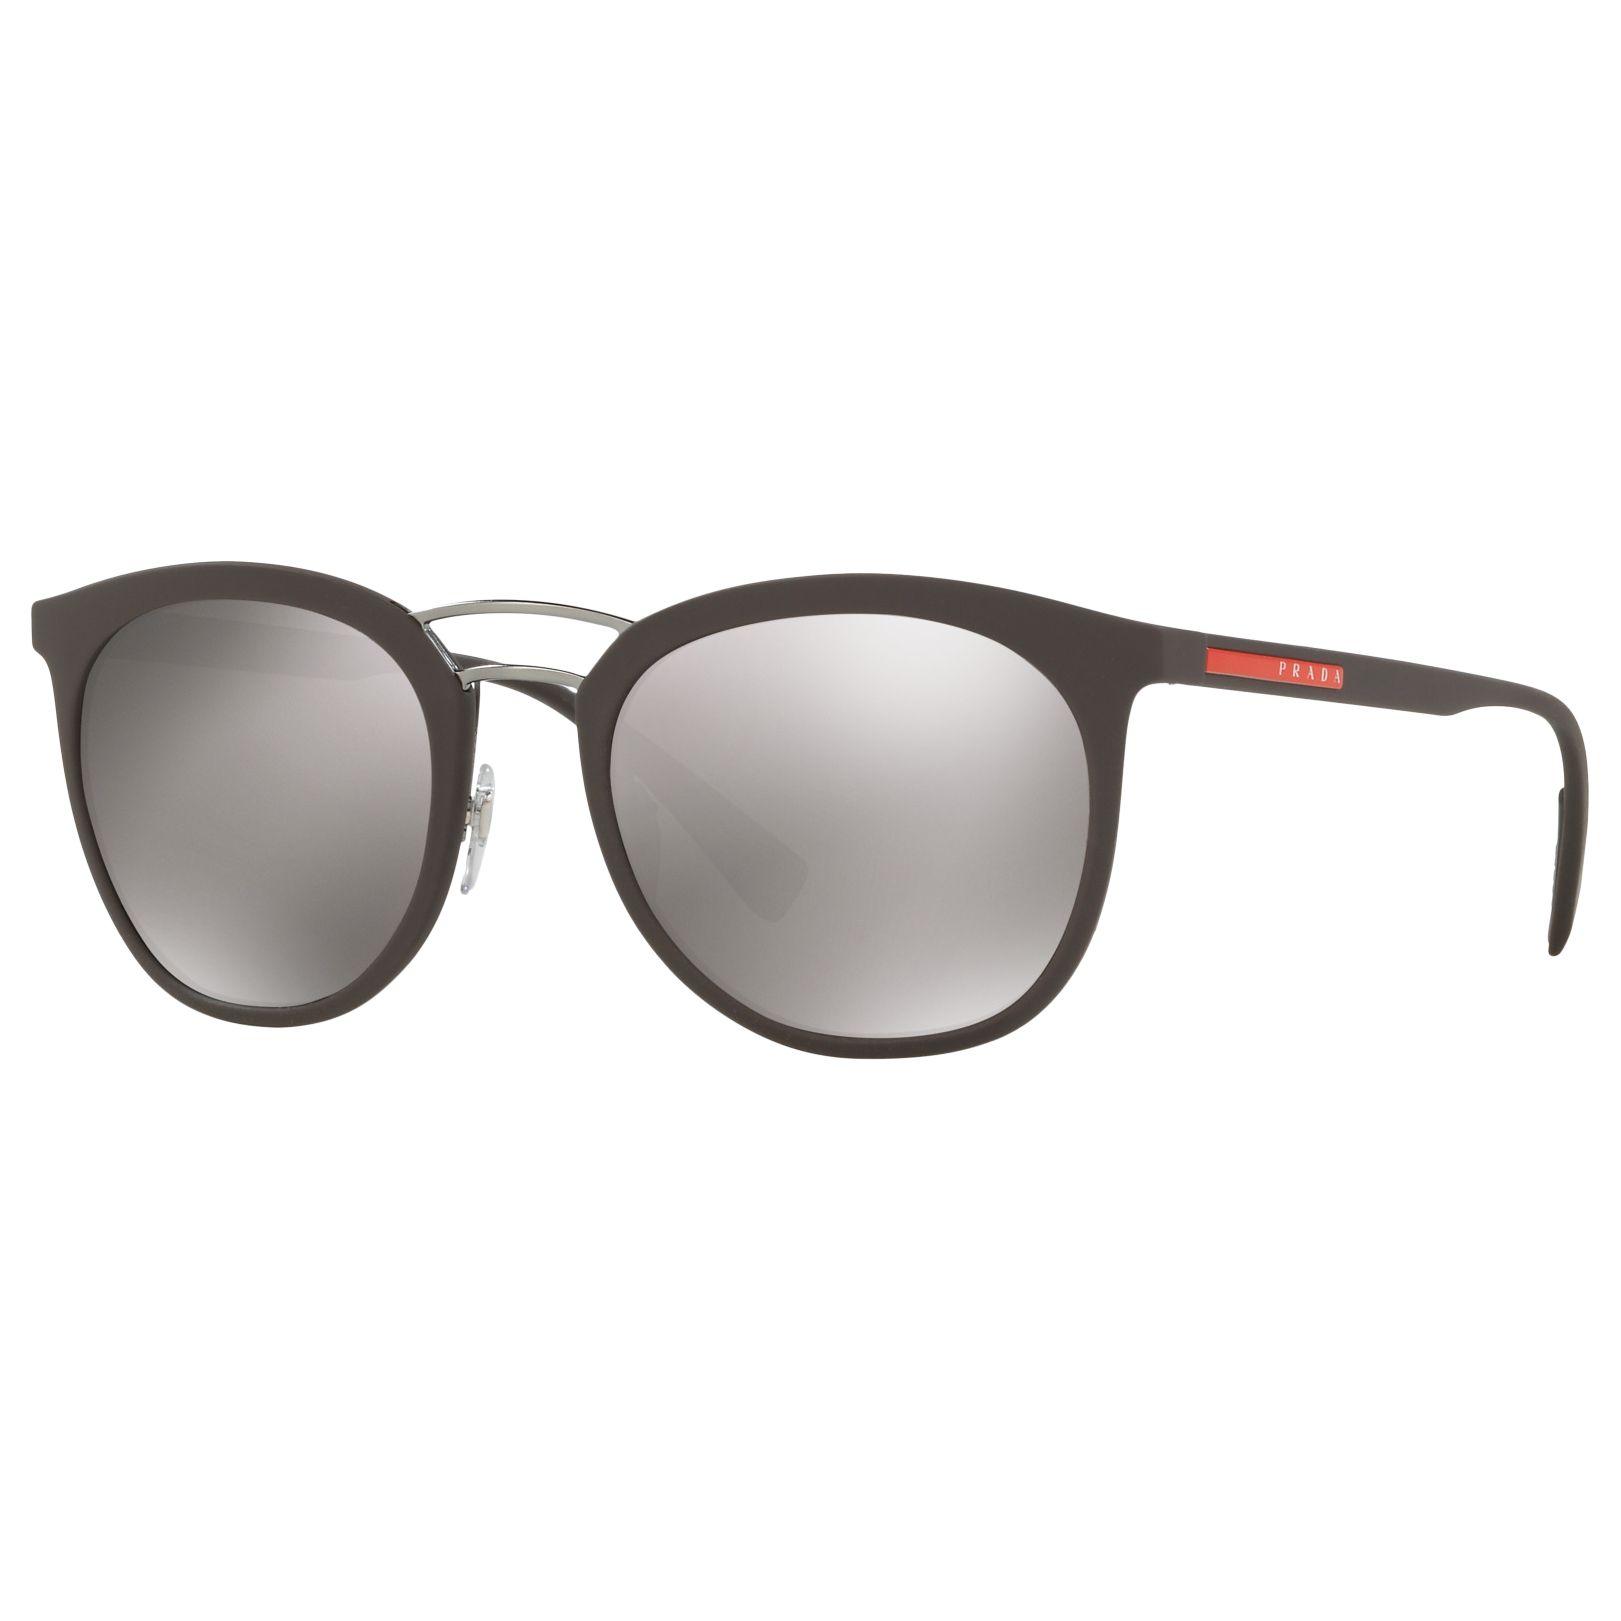 Prada Linea Rossa Prada Linea Rossa PS 04SS Polarised Oval Sunglasses, Matte Brown/Mirror Grey